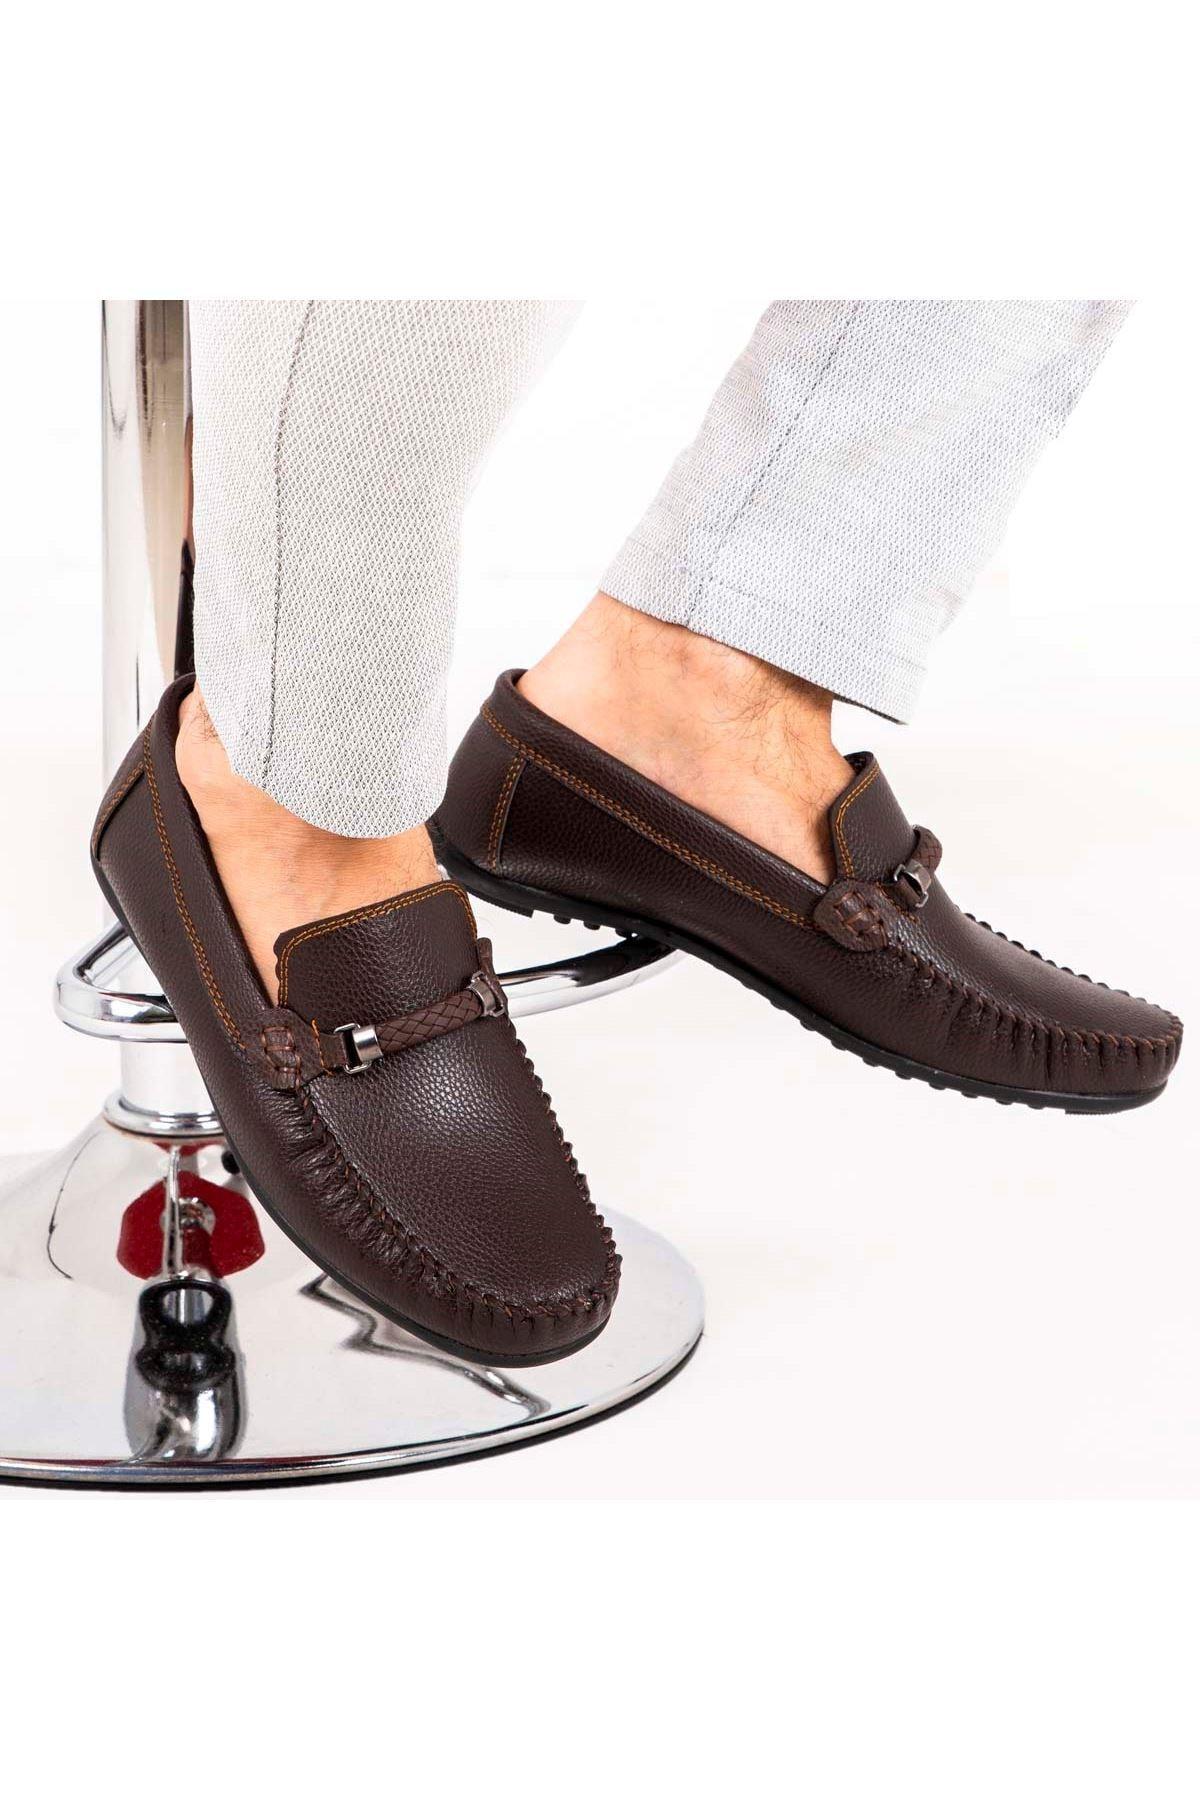 Ortopedik Loafer Erkek Ayakkabı Mln1102 Kahverengi